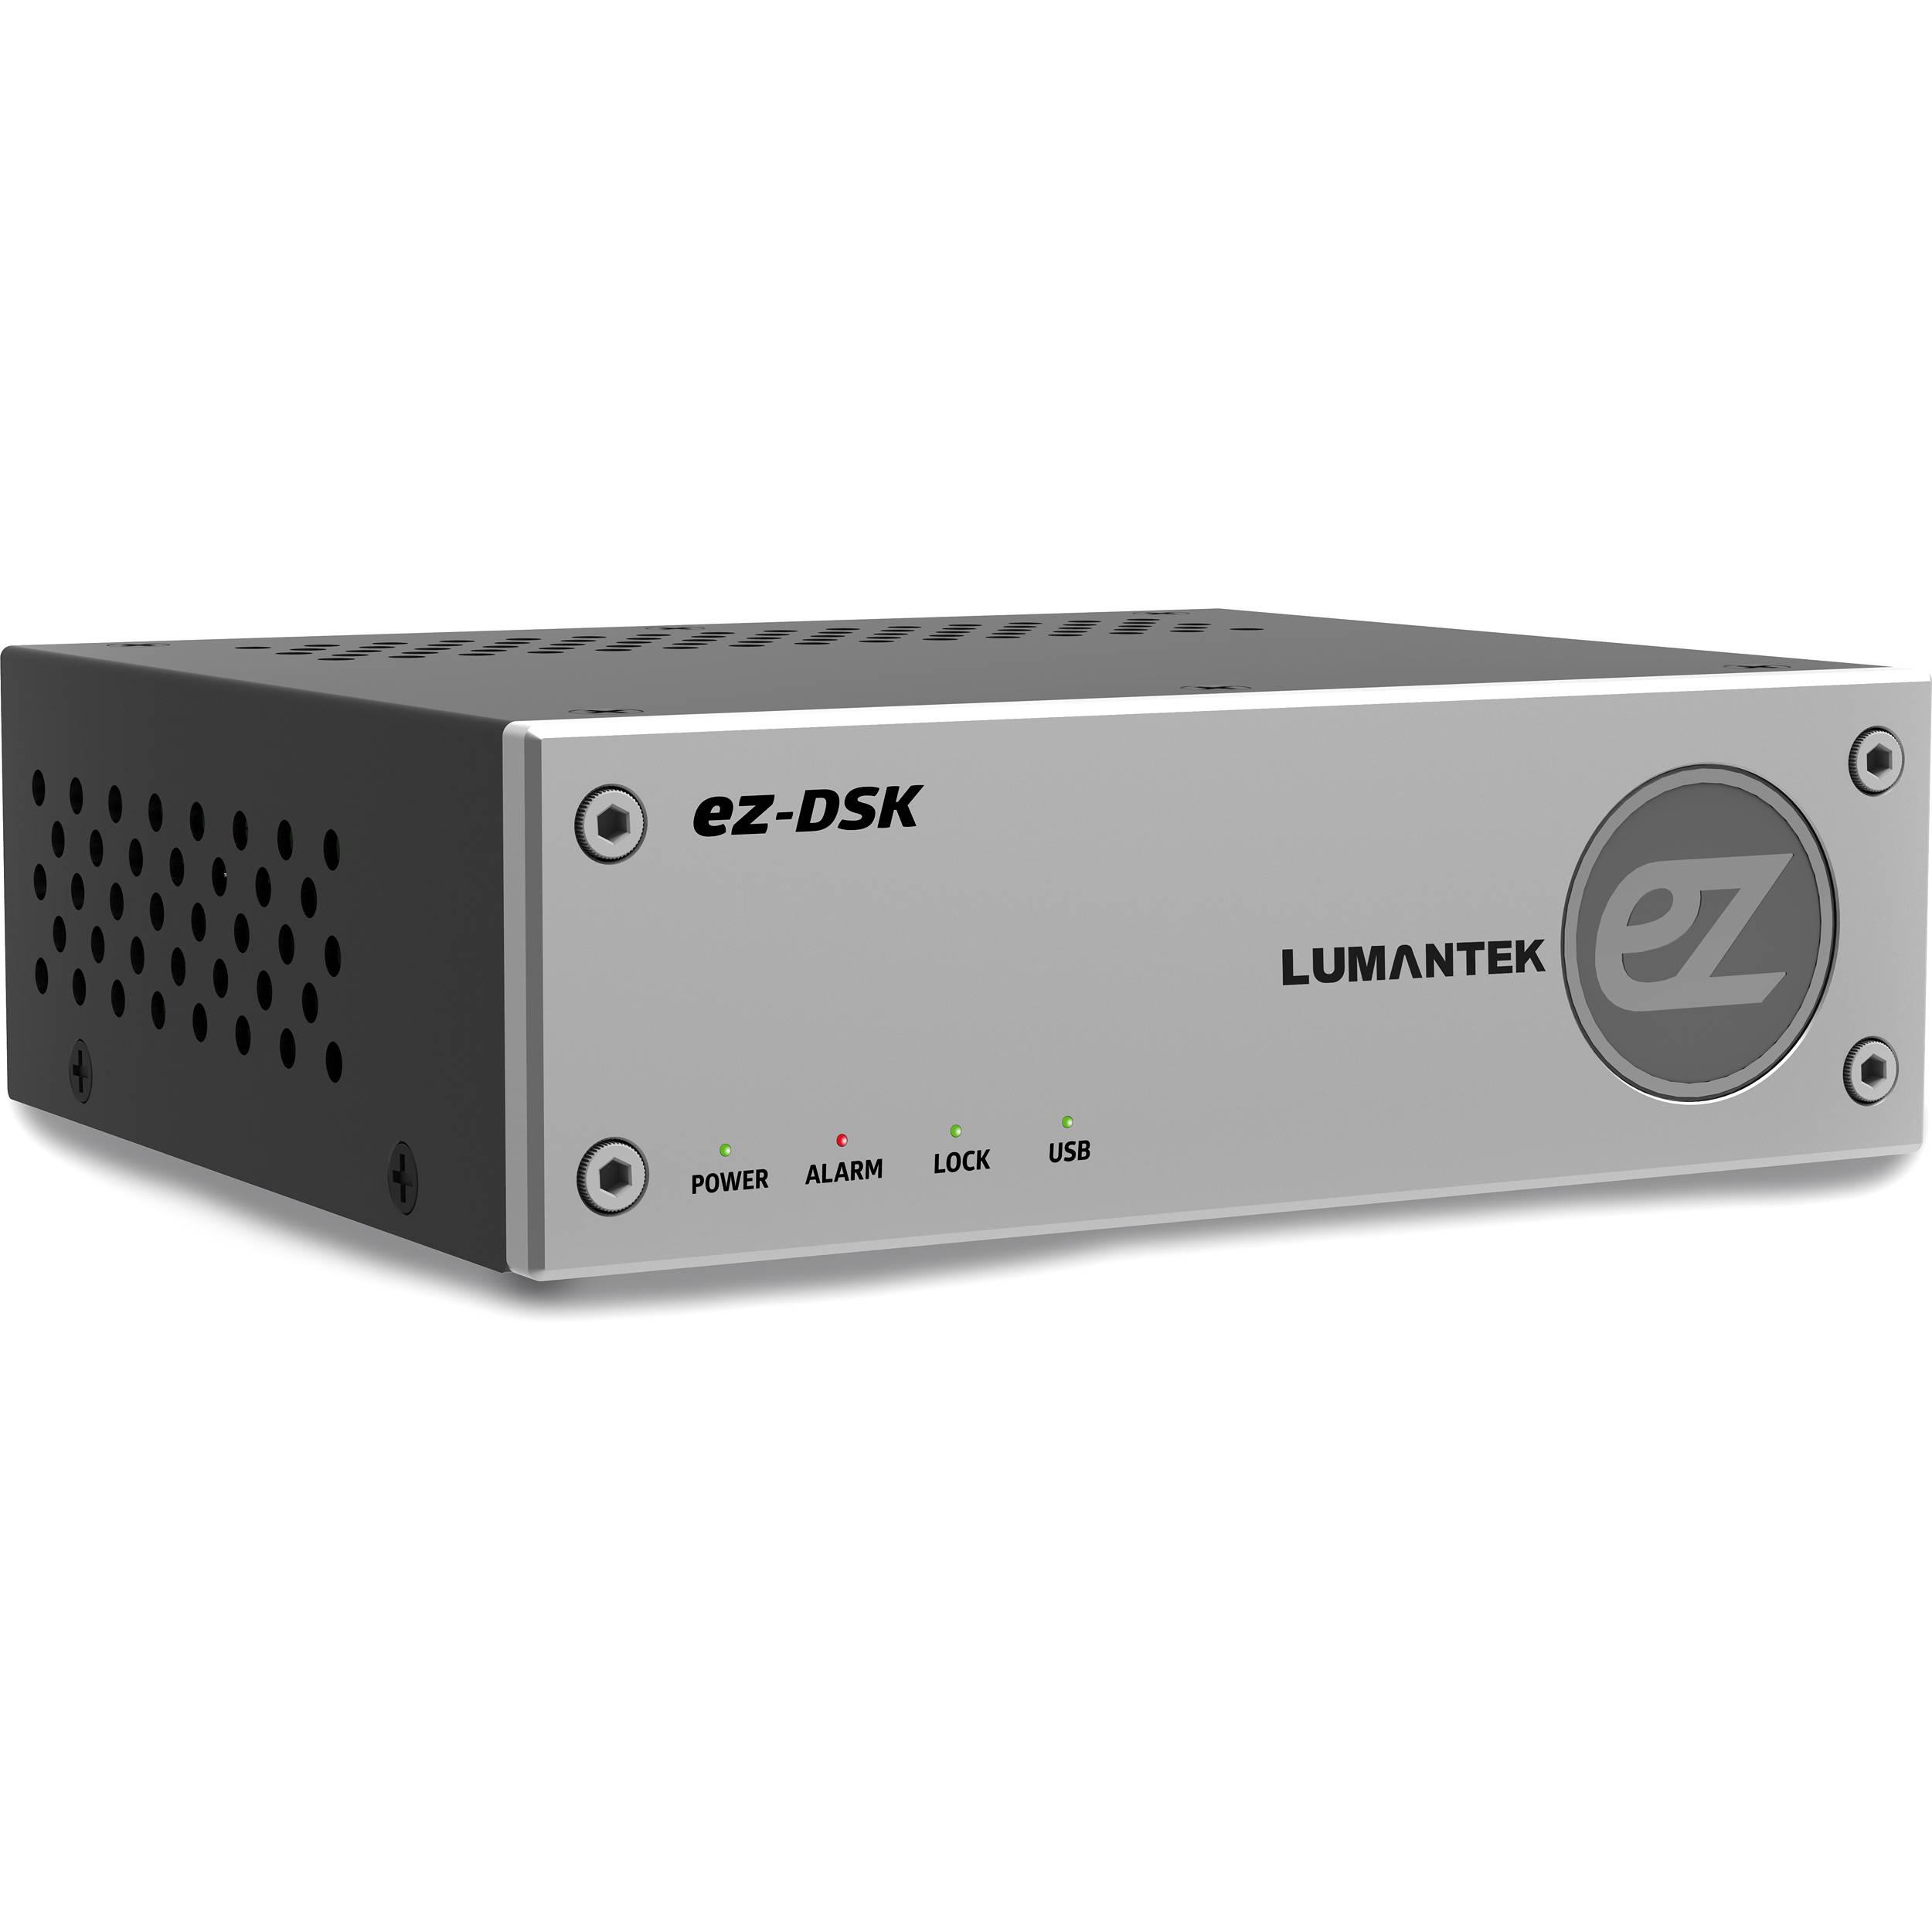 Lumantek ez-DSK Live CG Generator